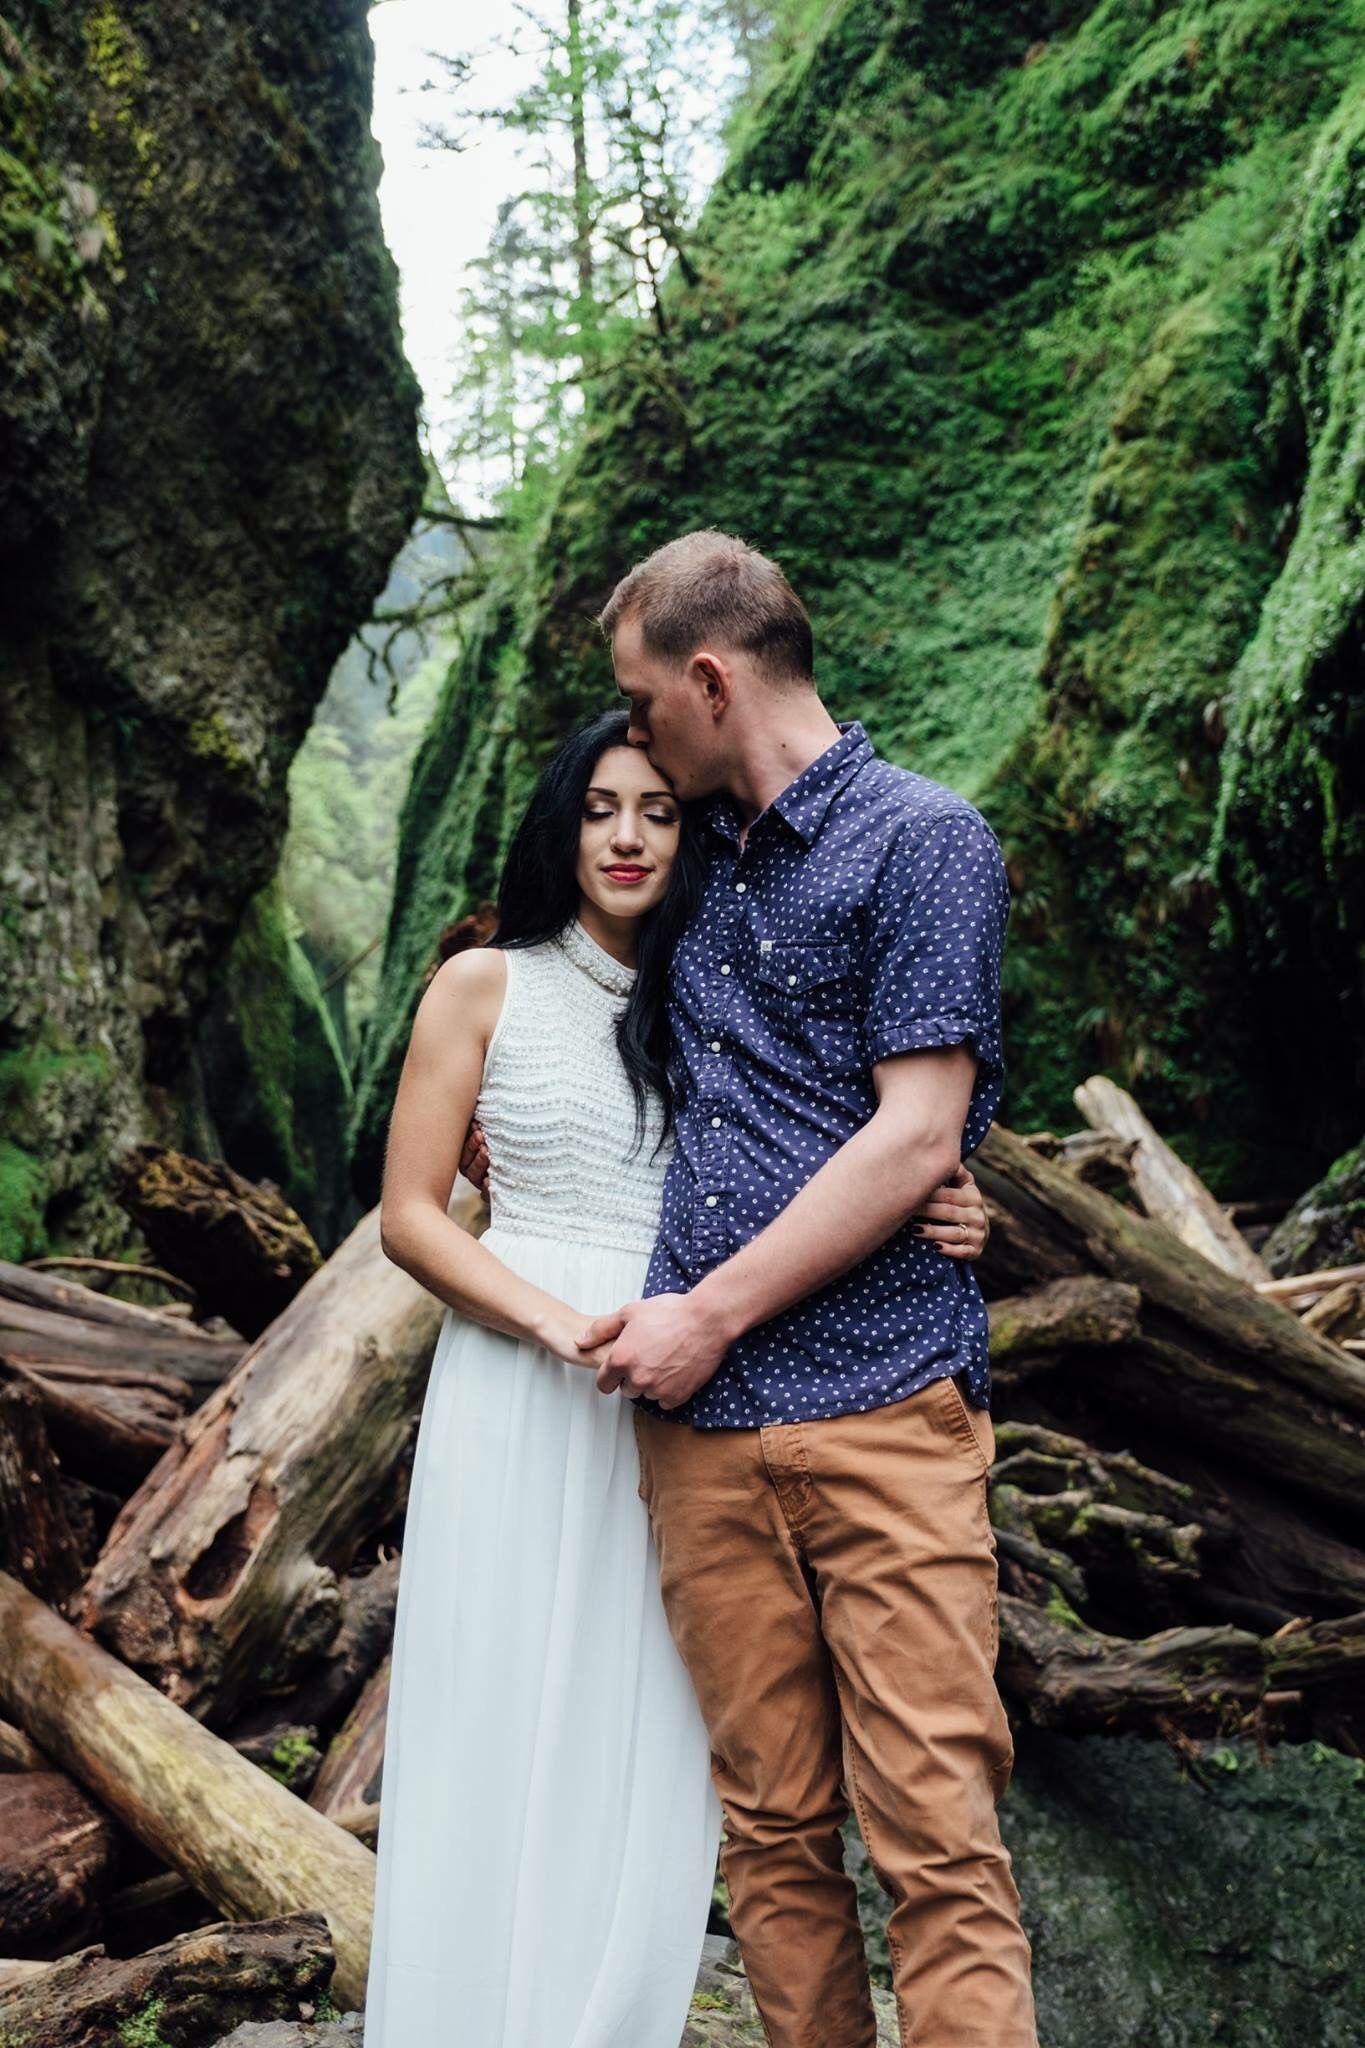 My engagement shoot ❤️